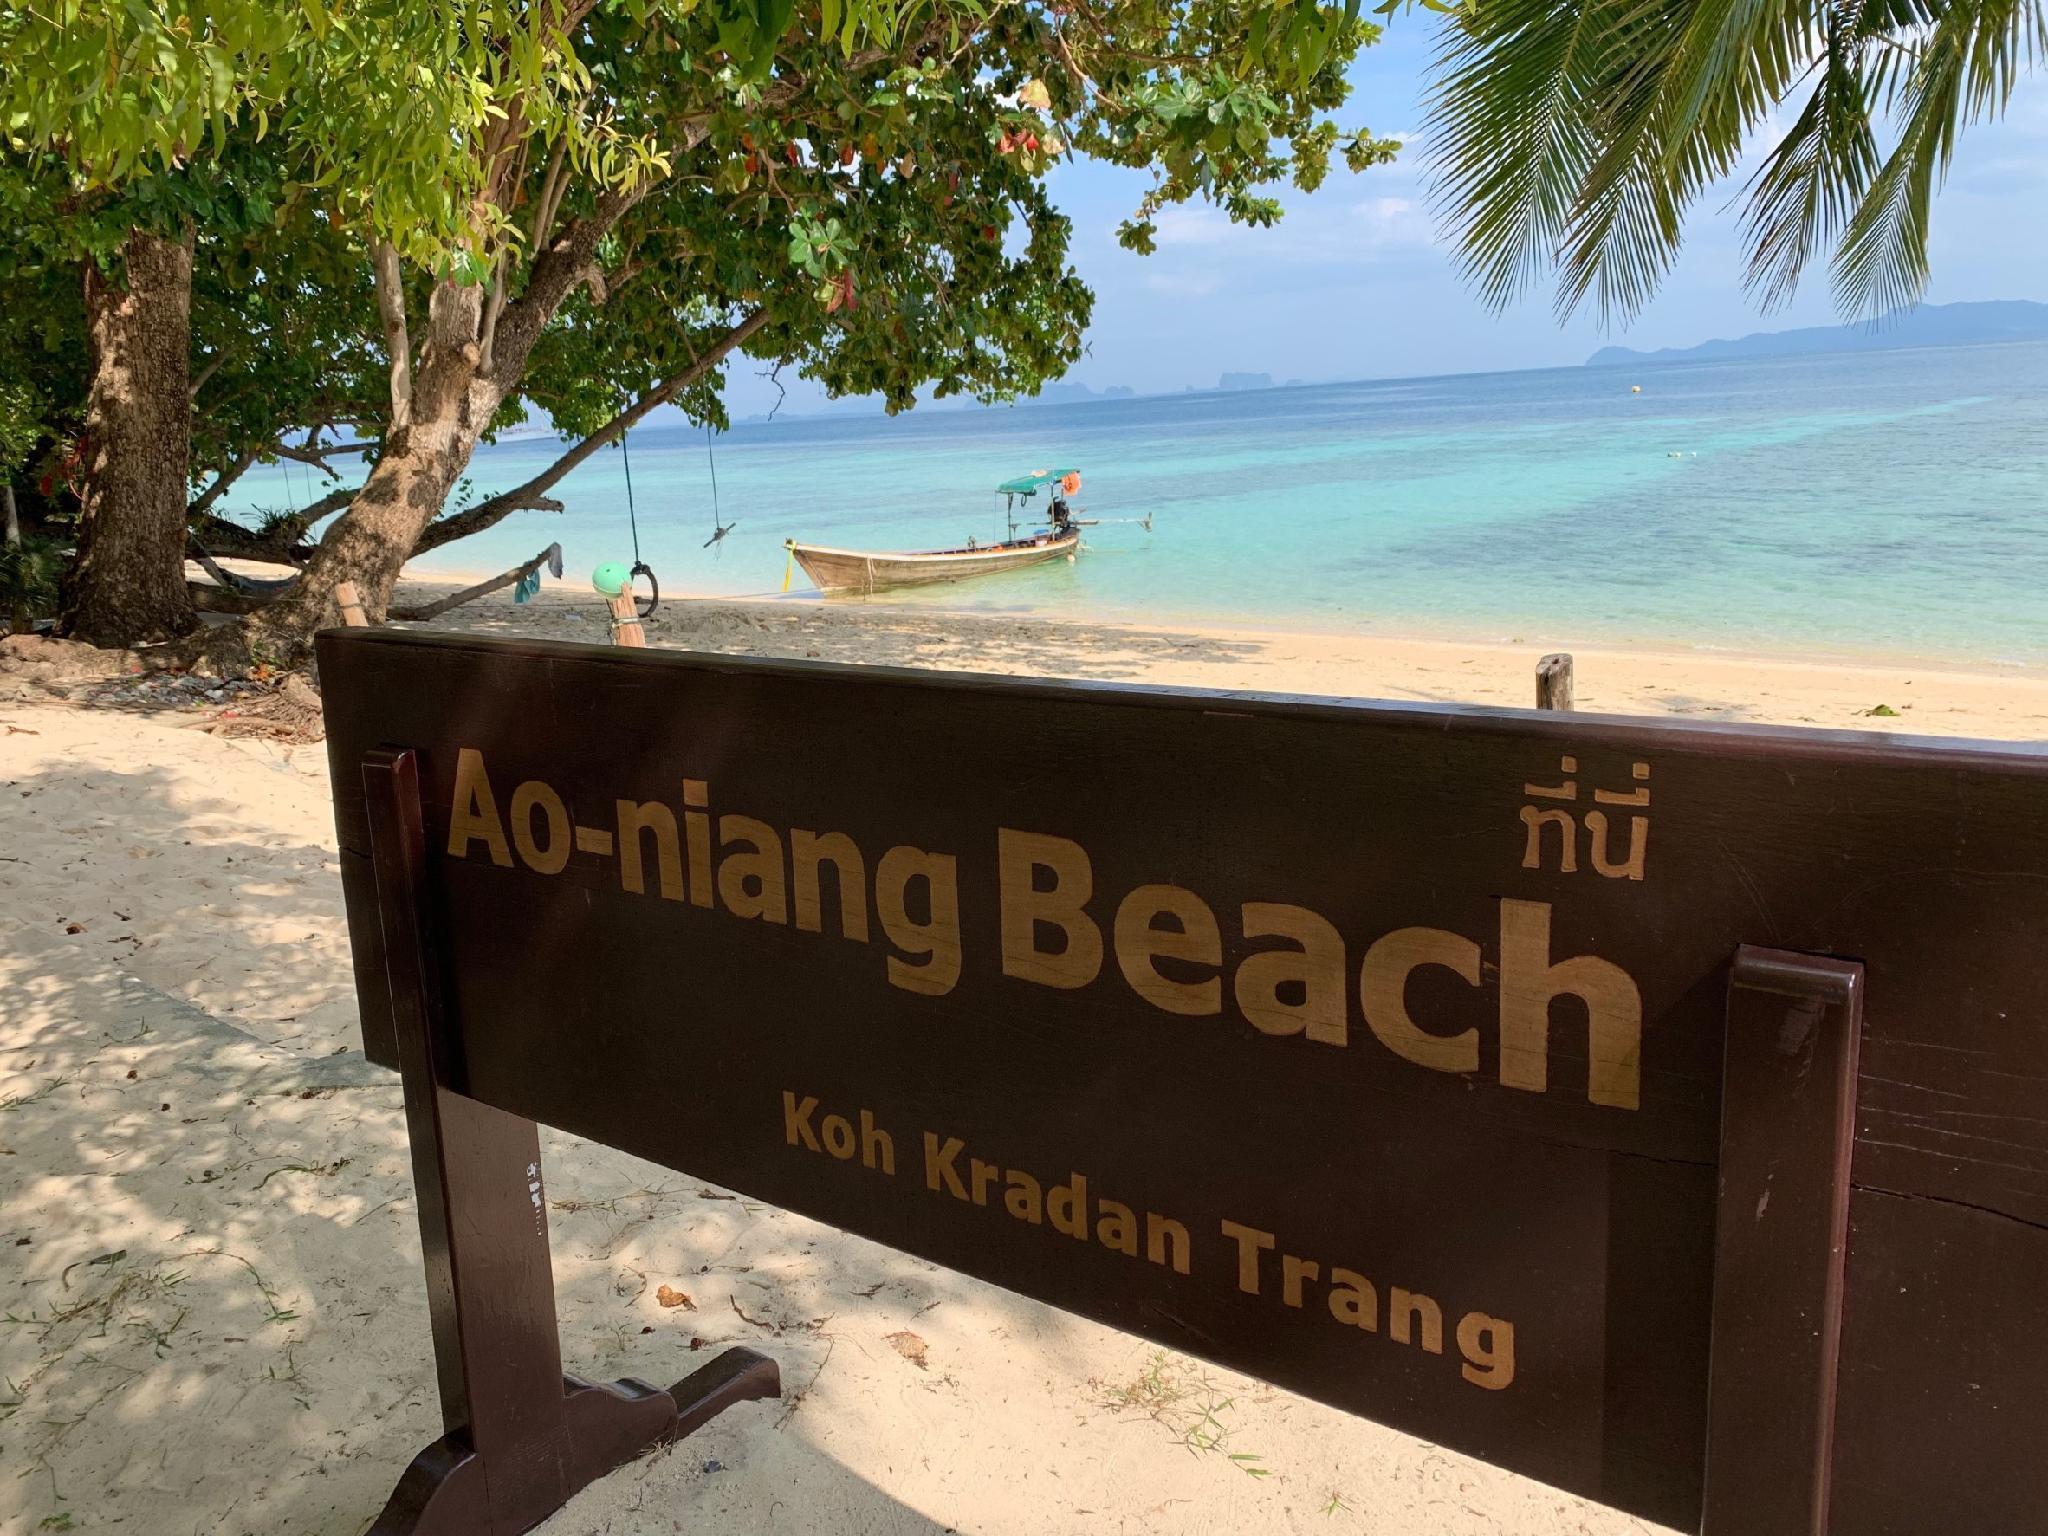 Ao-Niang Beach Resort สตูดิโอ บังกะโล 1 ห้องน้ำส่วนตัว ขนาด 24 ตร.ม. – เกาะกระดาน